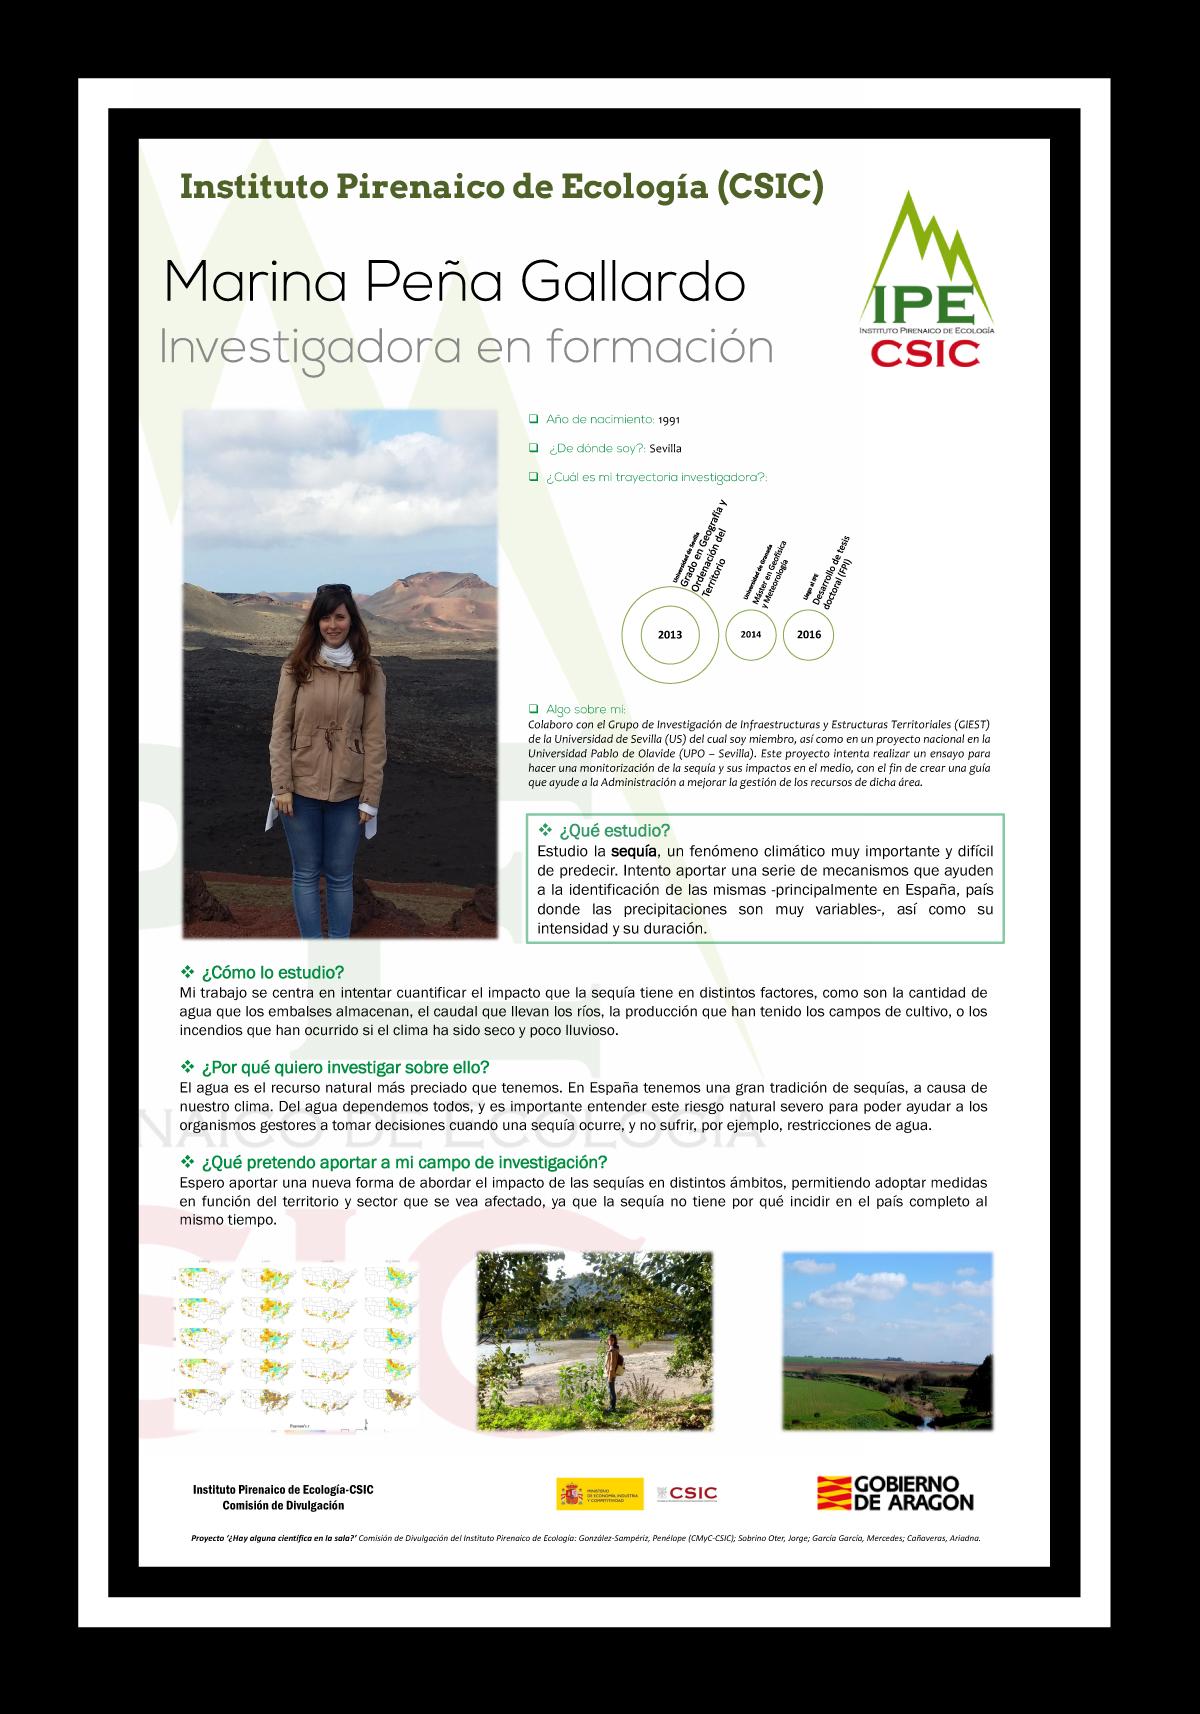 Marina Peña Gallardo